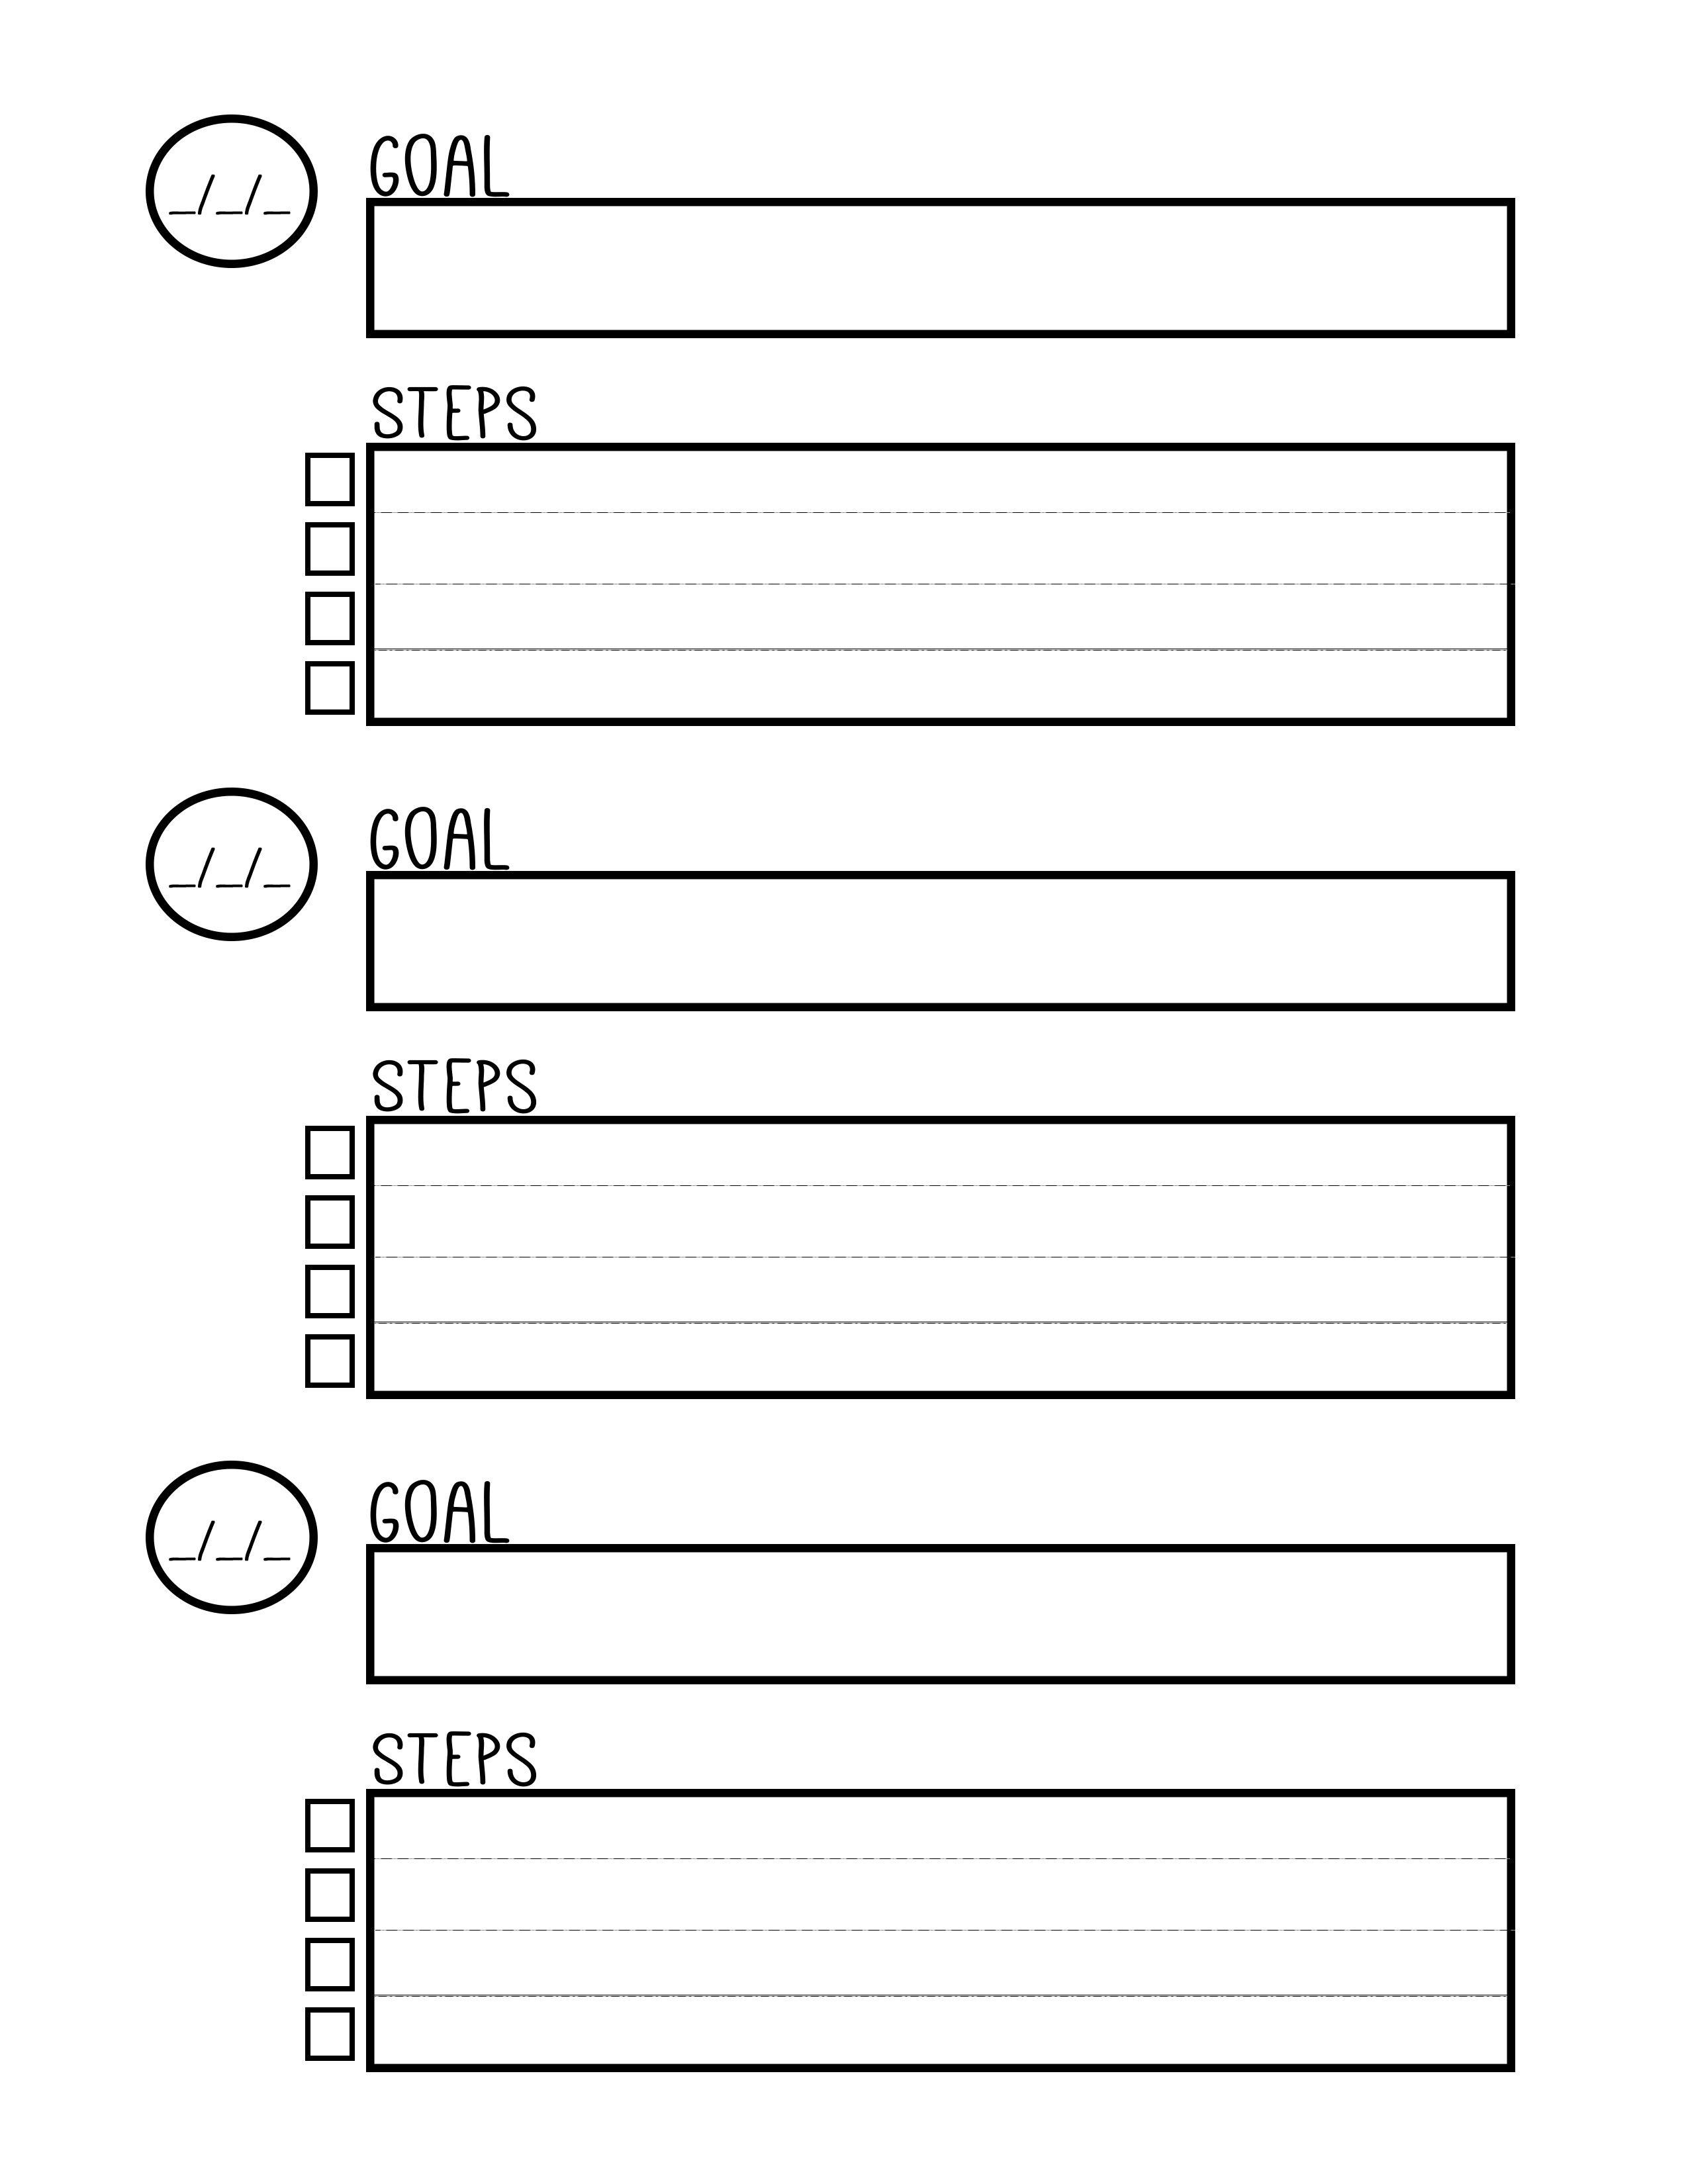 Free Printable Goal Setting Worksheet - Planner …   Education - Free Printable Goal Setting Worksheets For Students